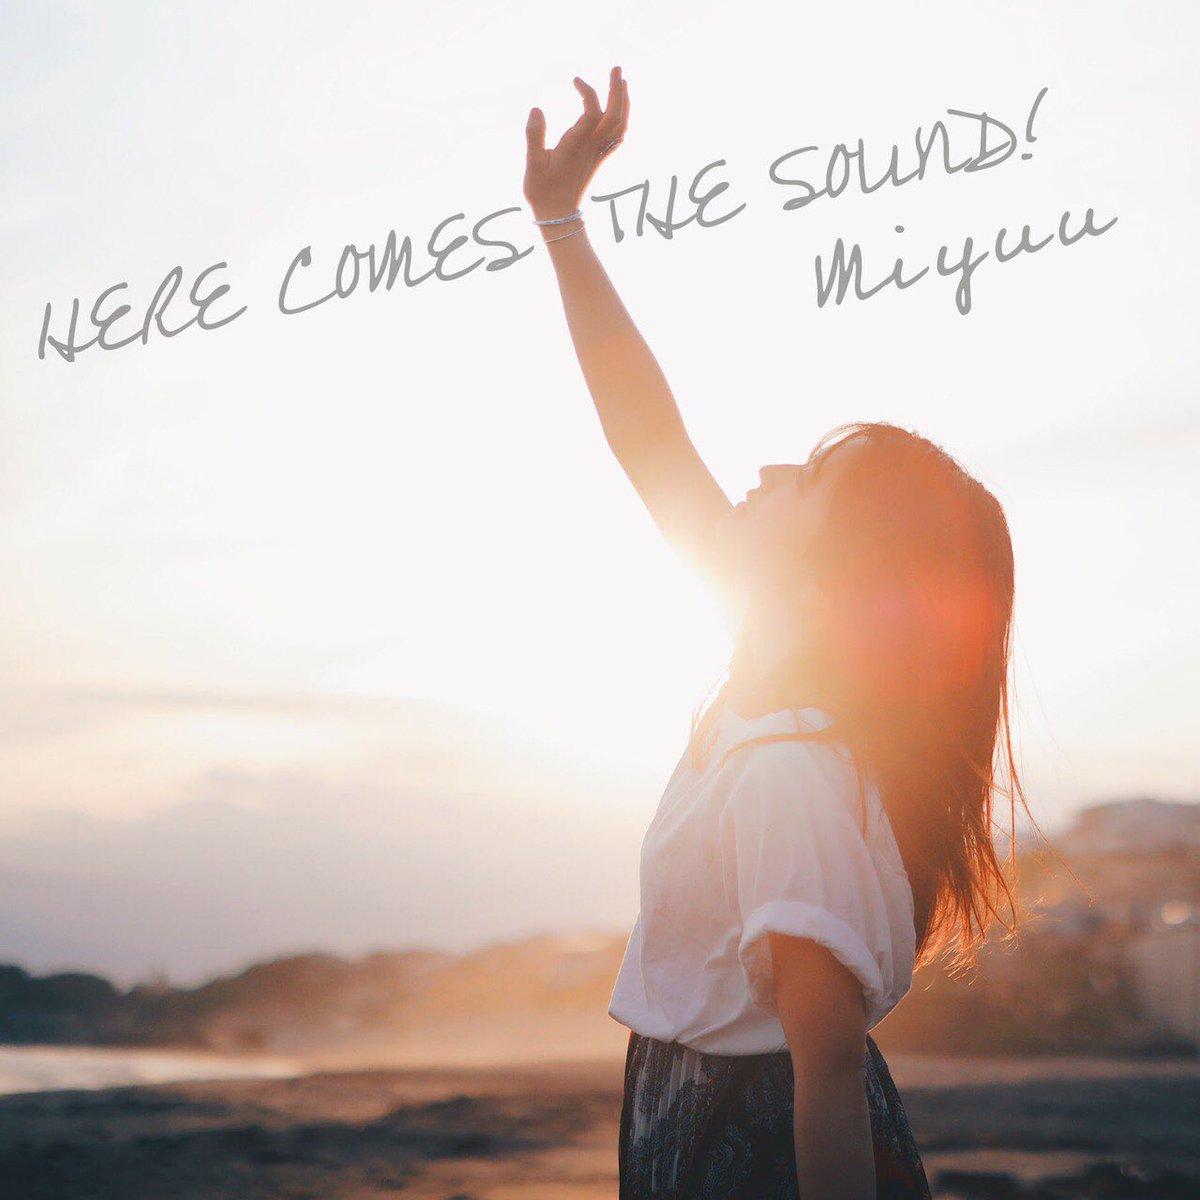 『Miyuu - closer again』収録の『HERE COMES THE SOUND!』ジャケット